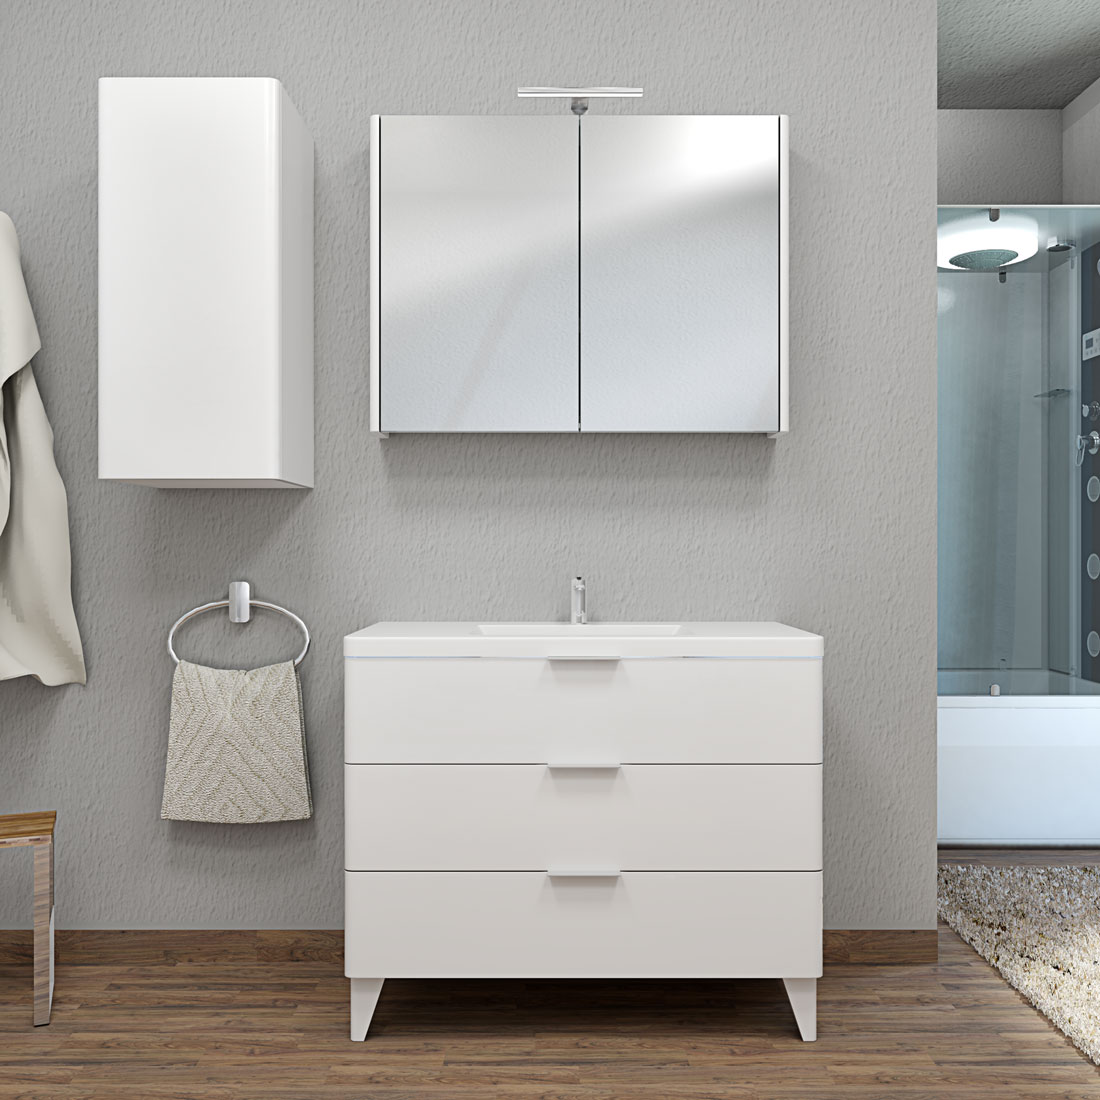 badm bel set curve 106 v2 mdf wei badezimmerm bel waschtisch 100cm. Black Bedroom Furniture Sets. Home Design Ideas